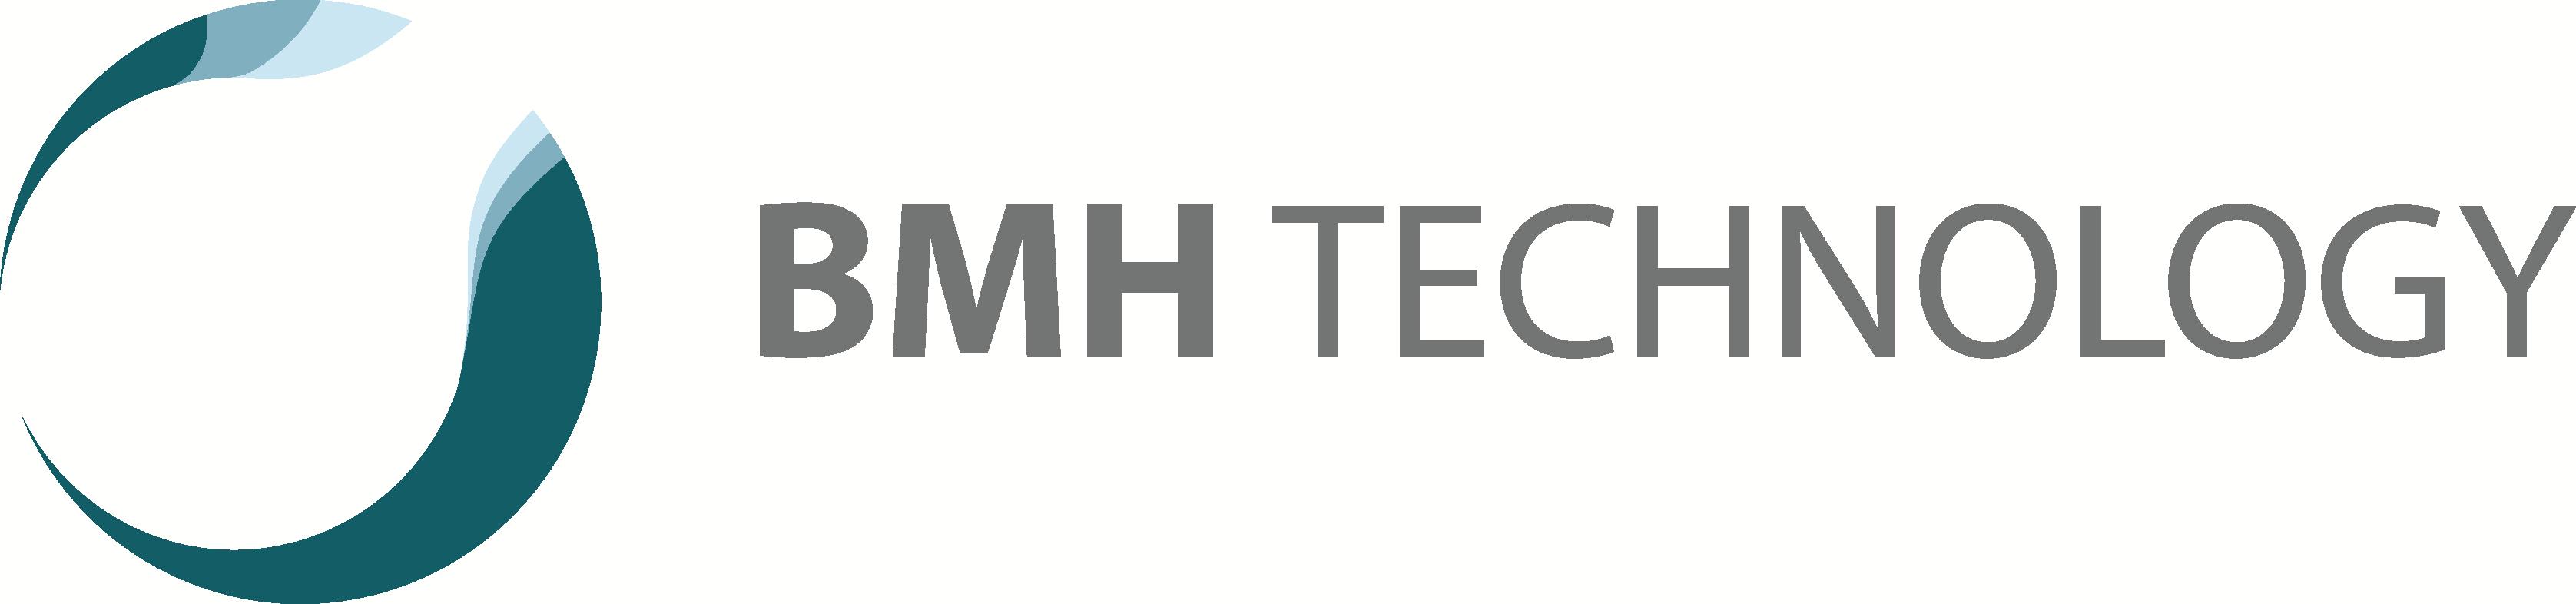 BMH Technology Oy